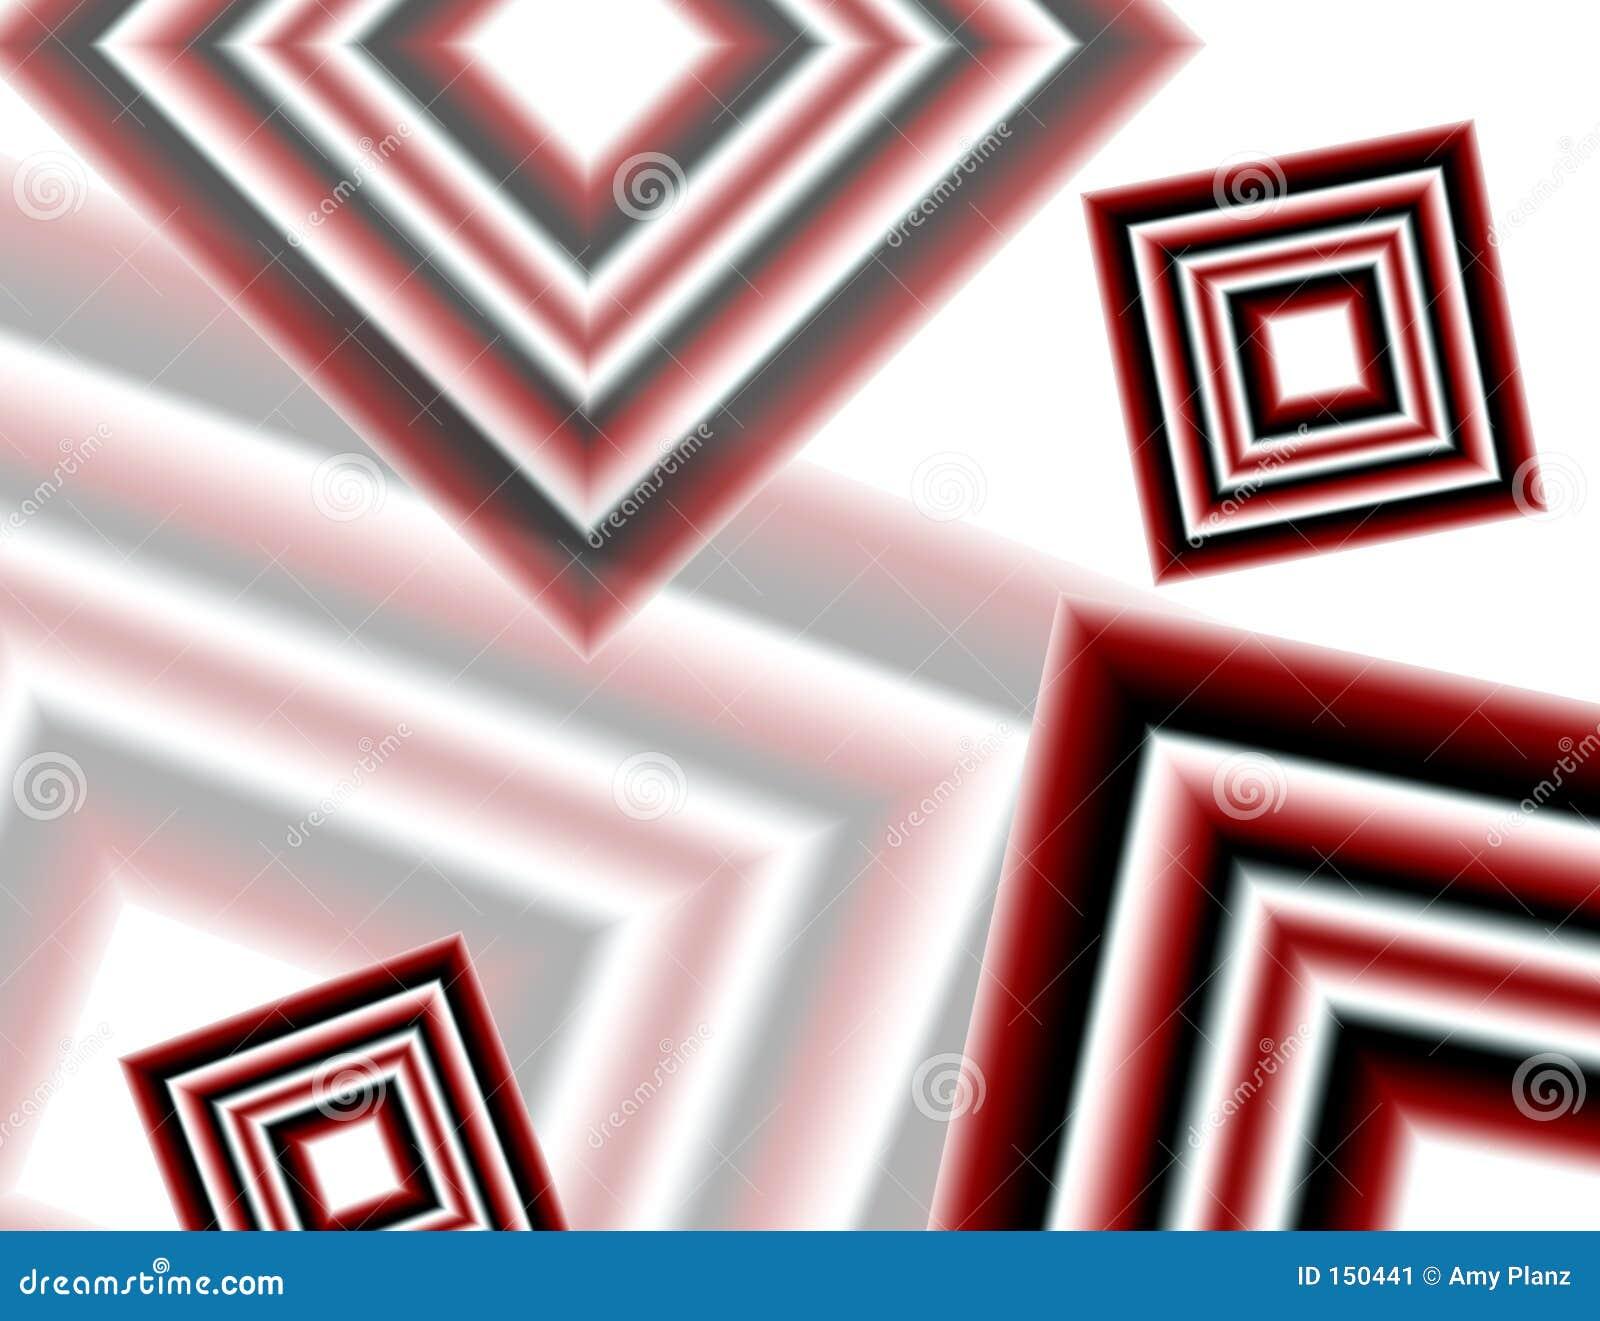 Red white and black diamonds